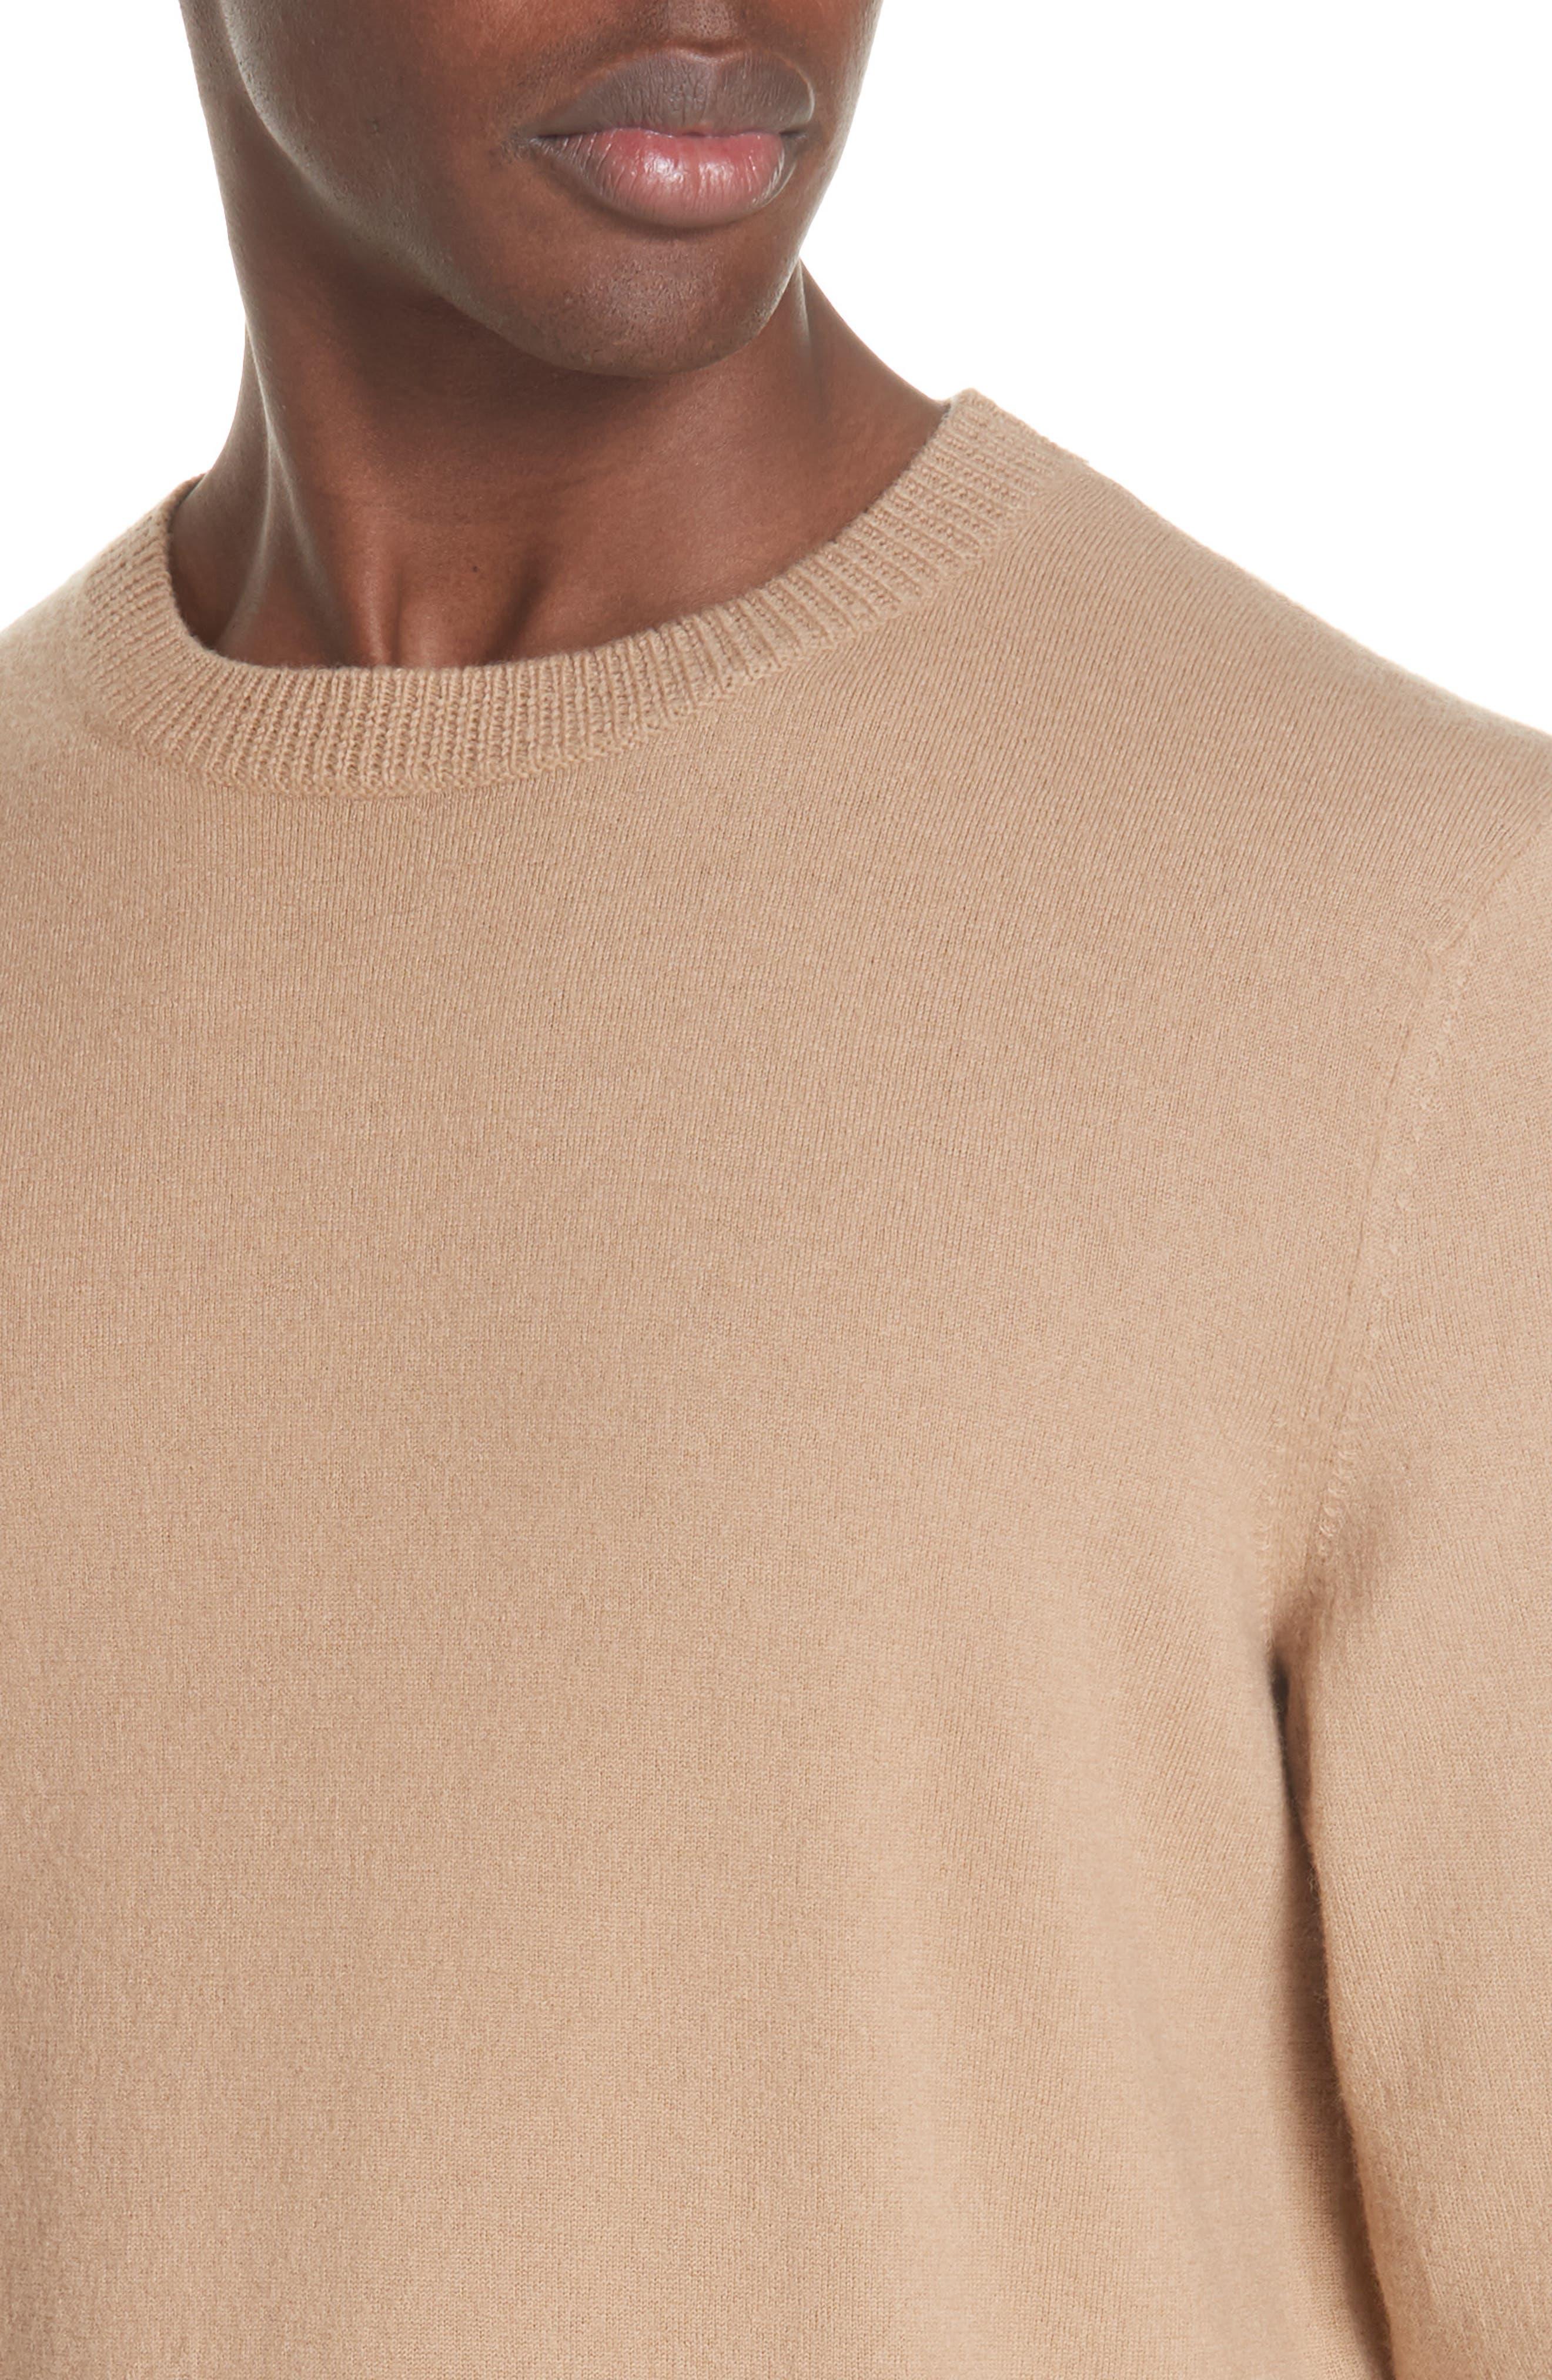 Merino Wool Crewneck Sweater,                             Alternate thumbnail 4, color,                             240